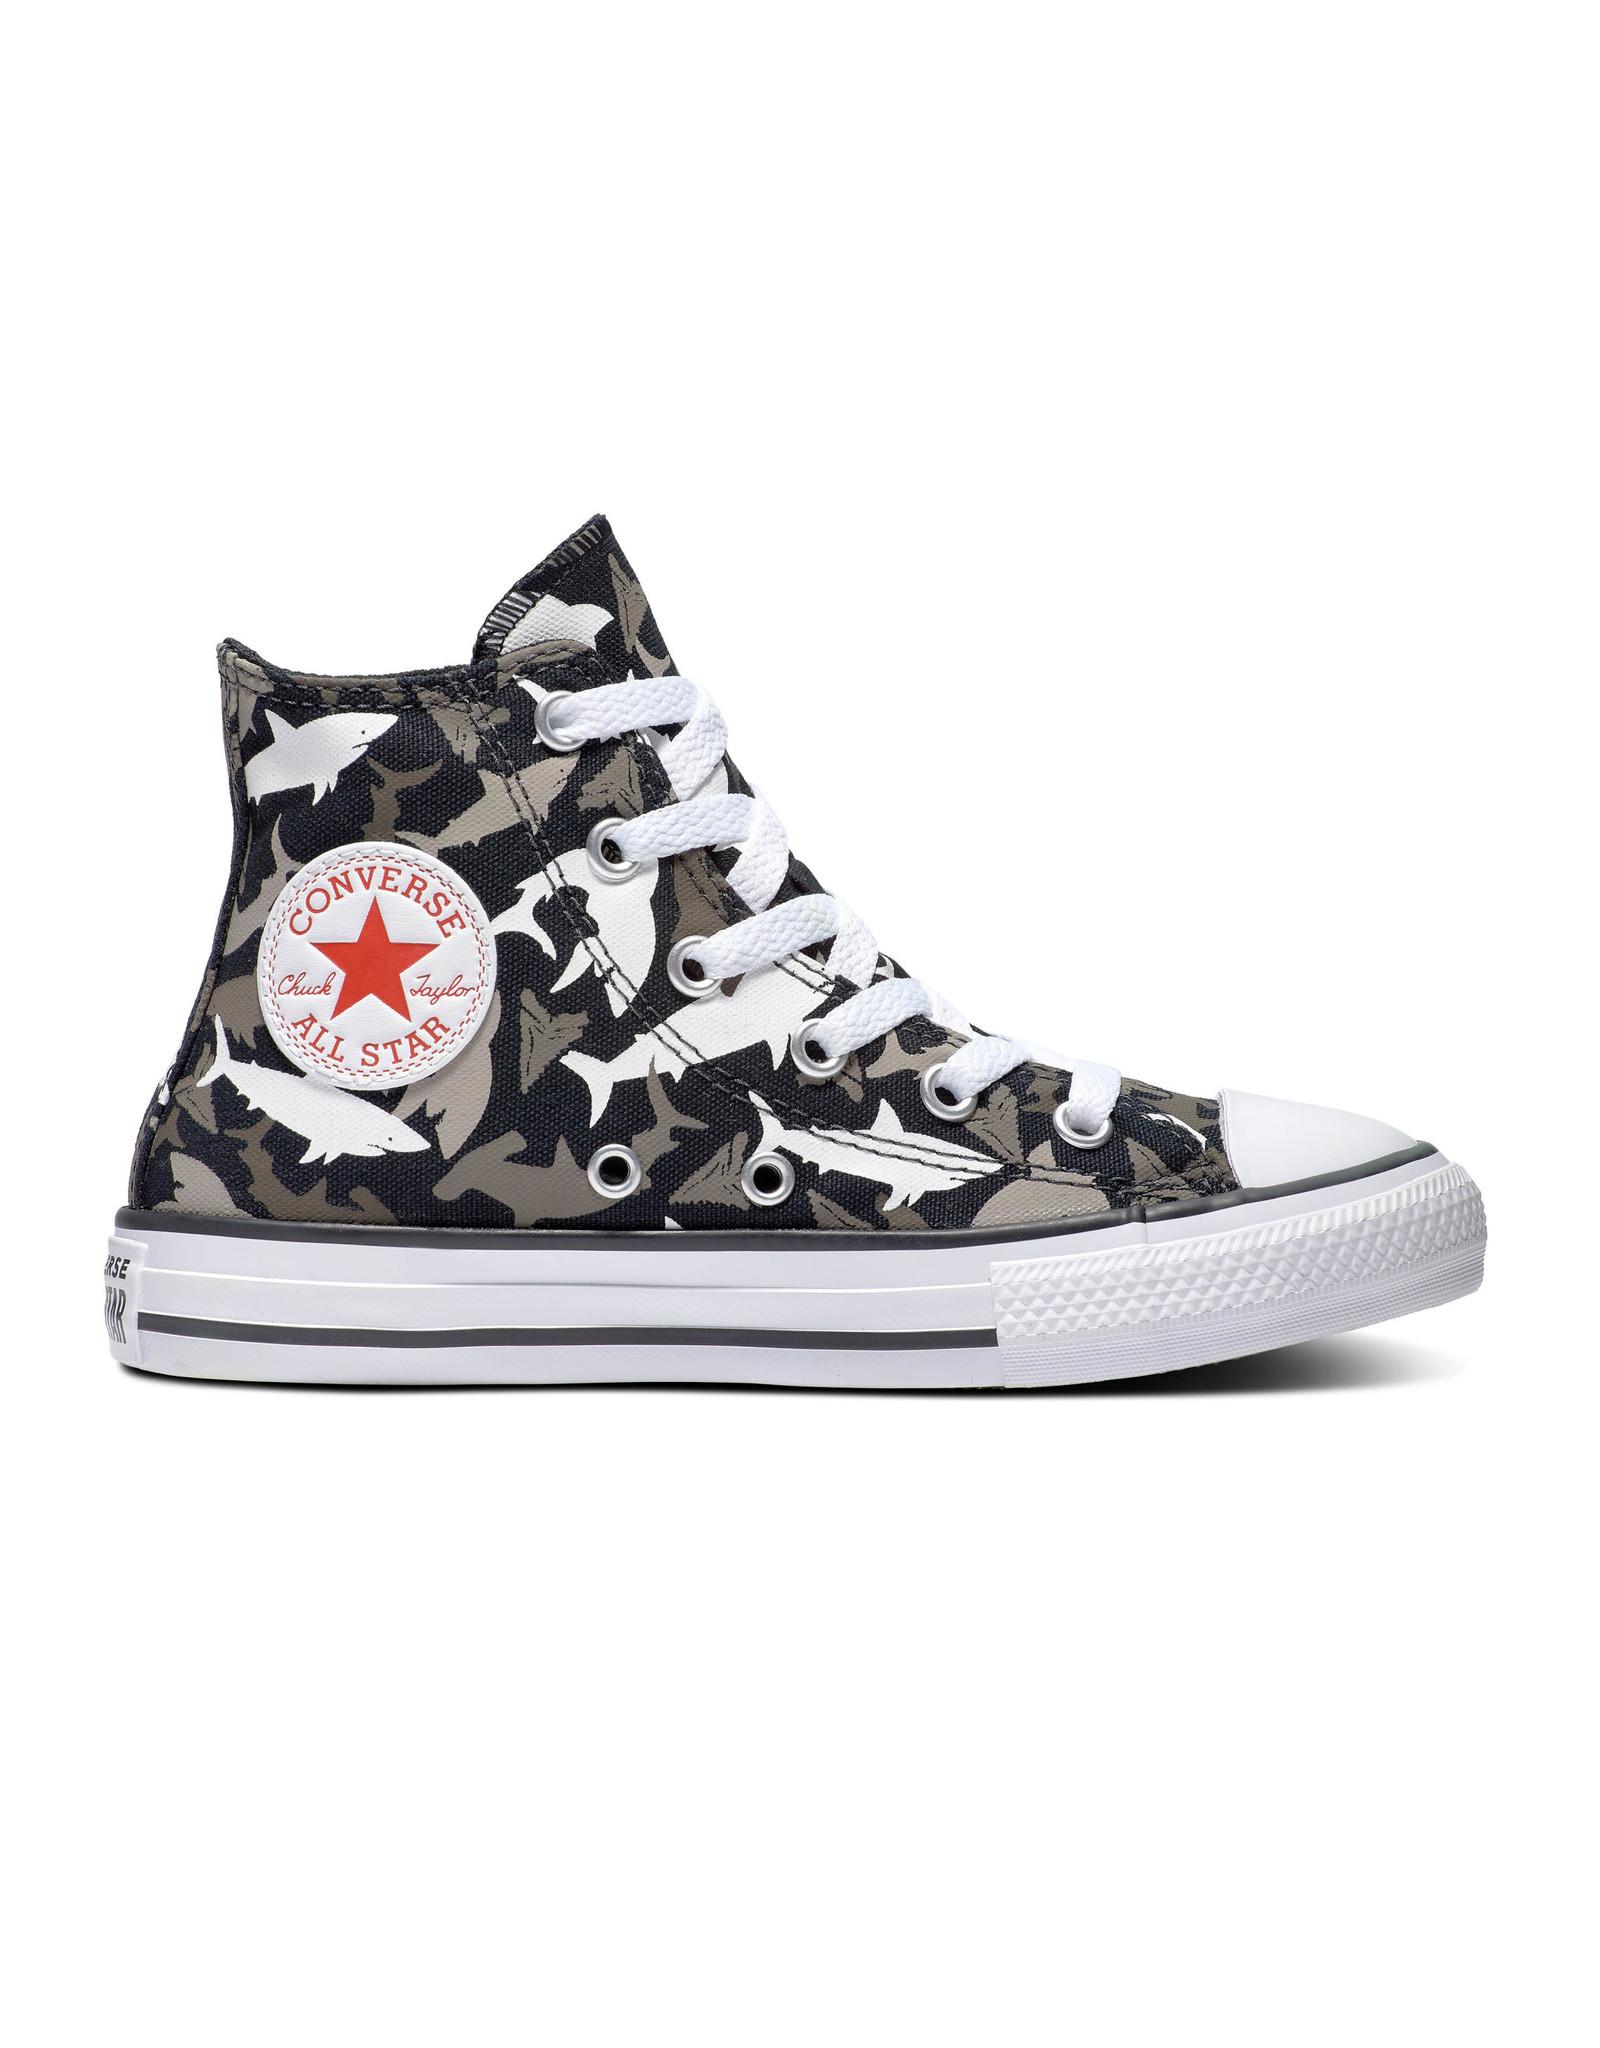 CONVERSE CHUCK TAYLOR ALL STAR  HI BLACK/UNIVERSITY RED/WHITE CAREQ-666888C